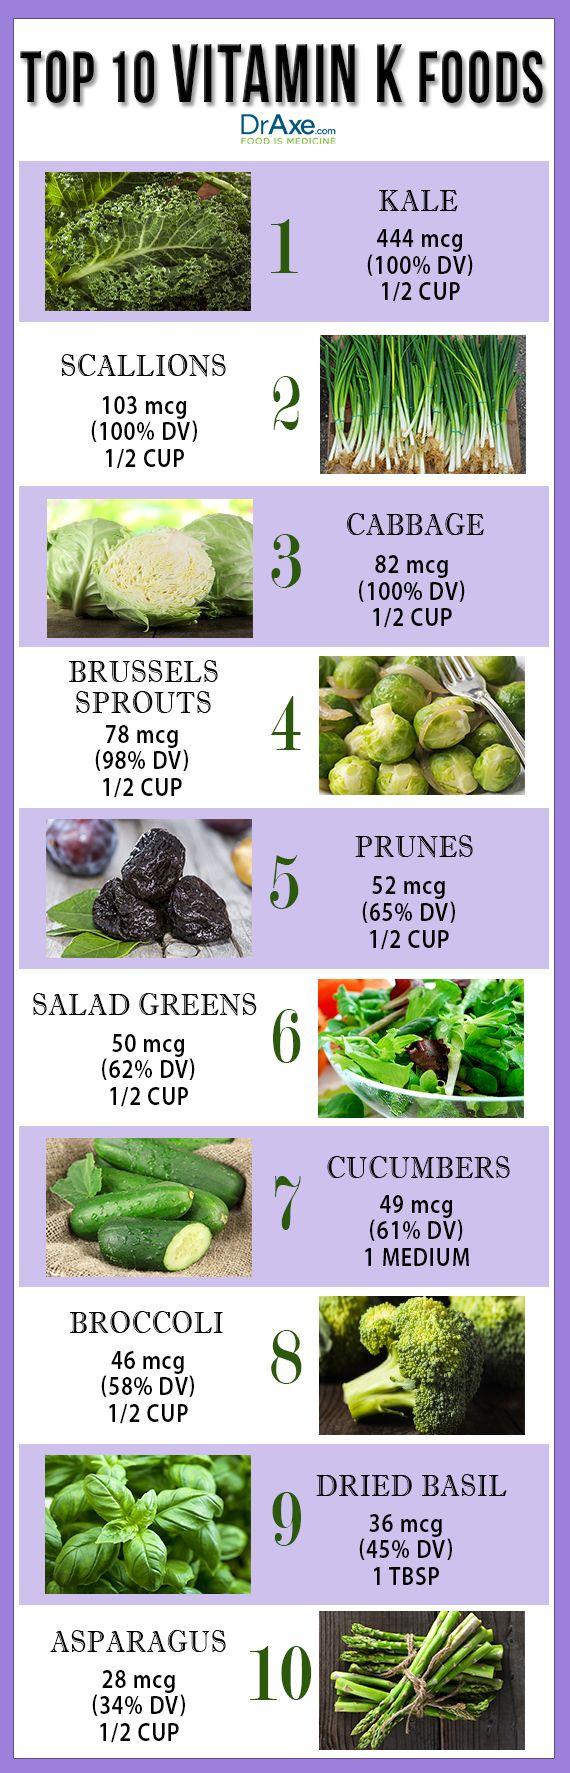 Vitamin K plays a vital role in healthy skin and hair, strong bones, heart healt... 1